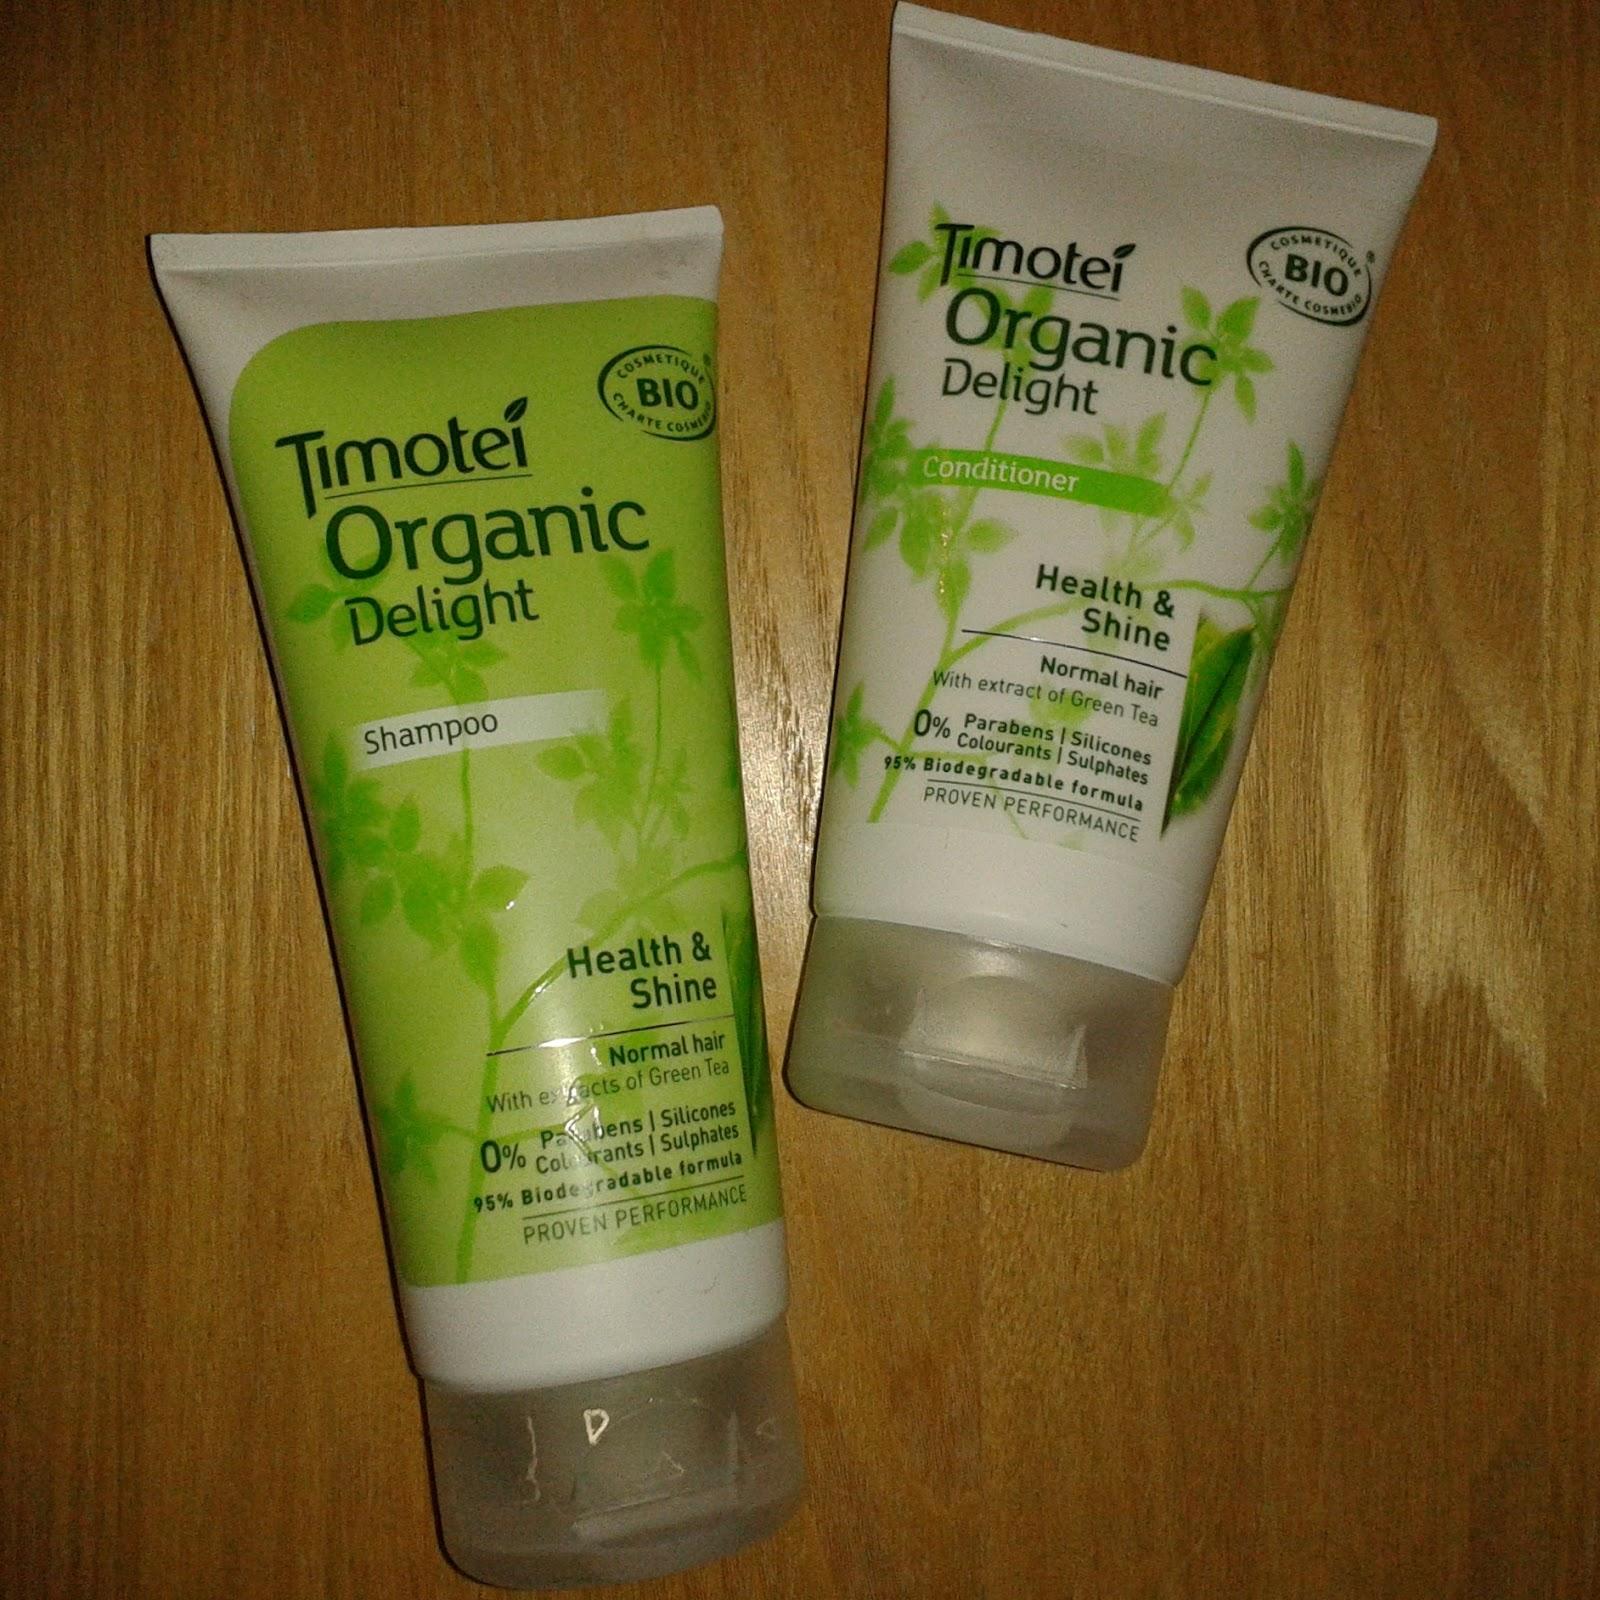 Timotei organic delight